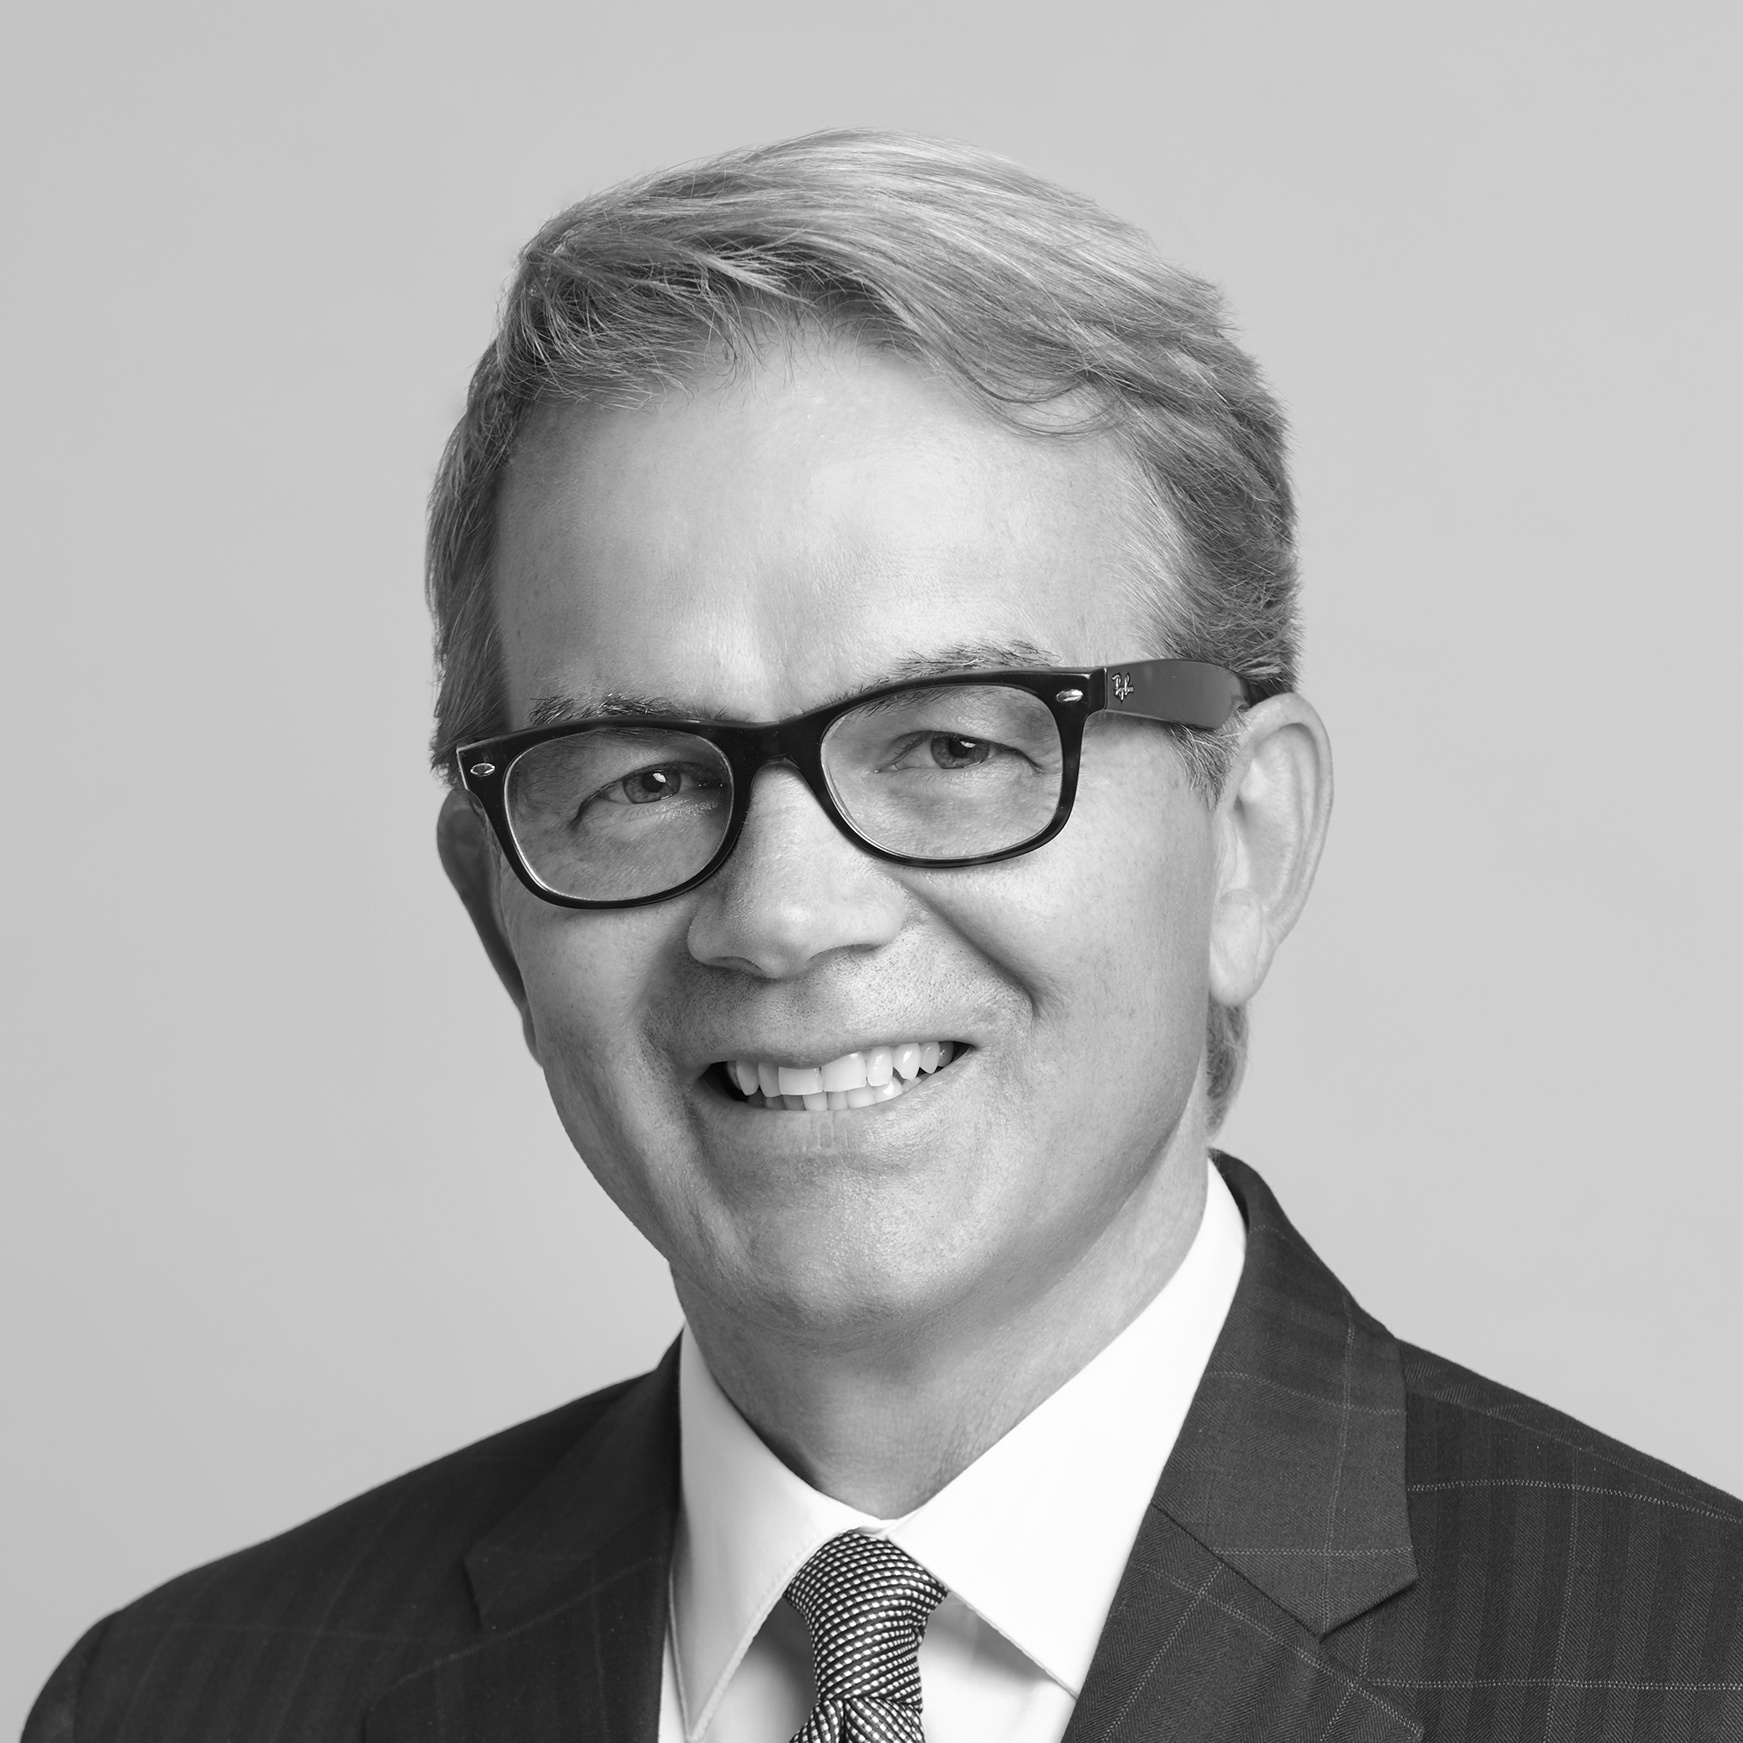 Tim Hanstad